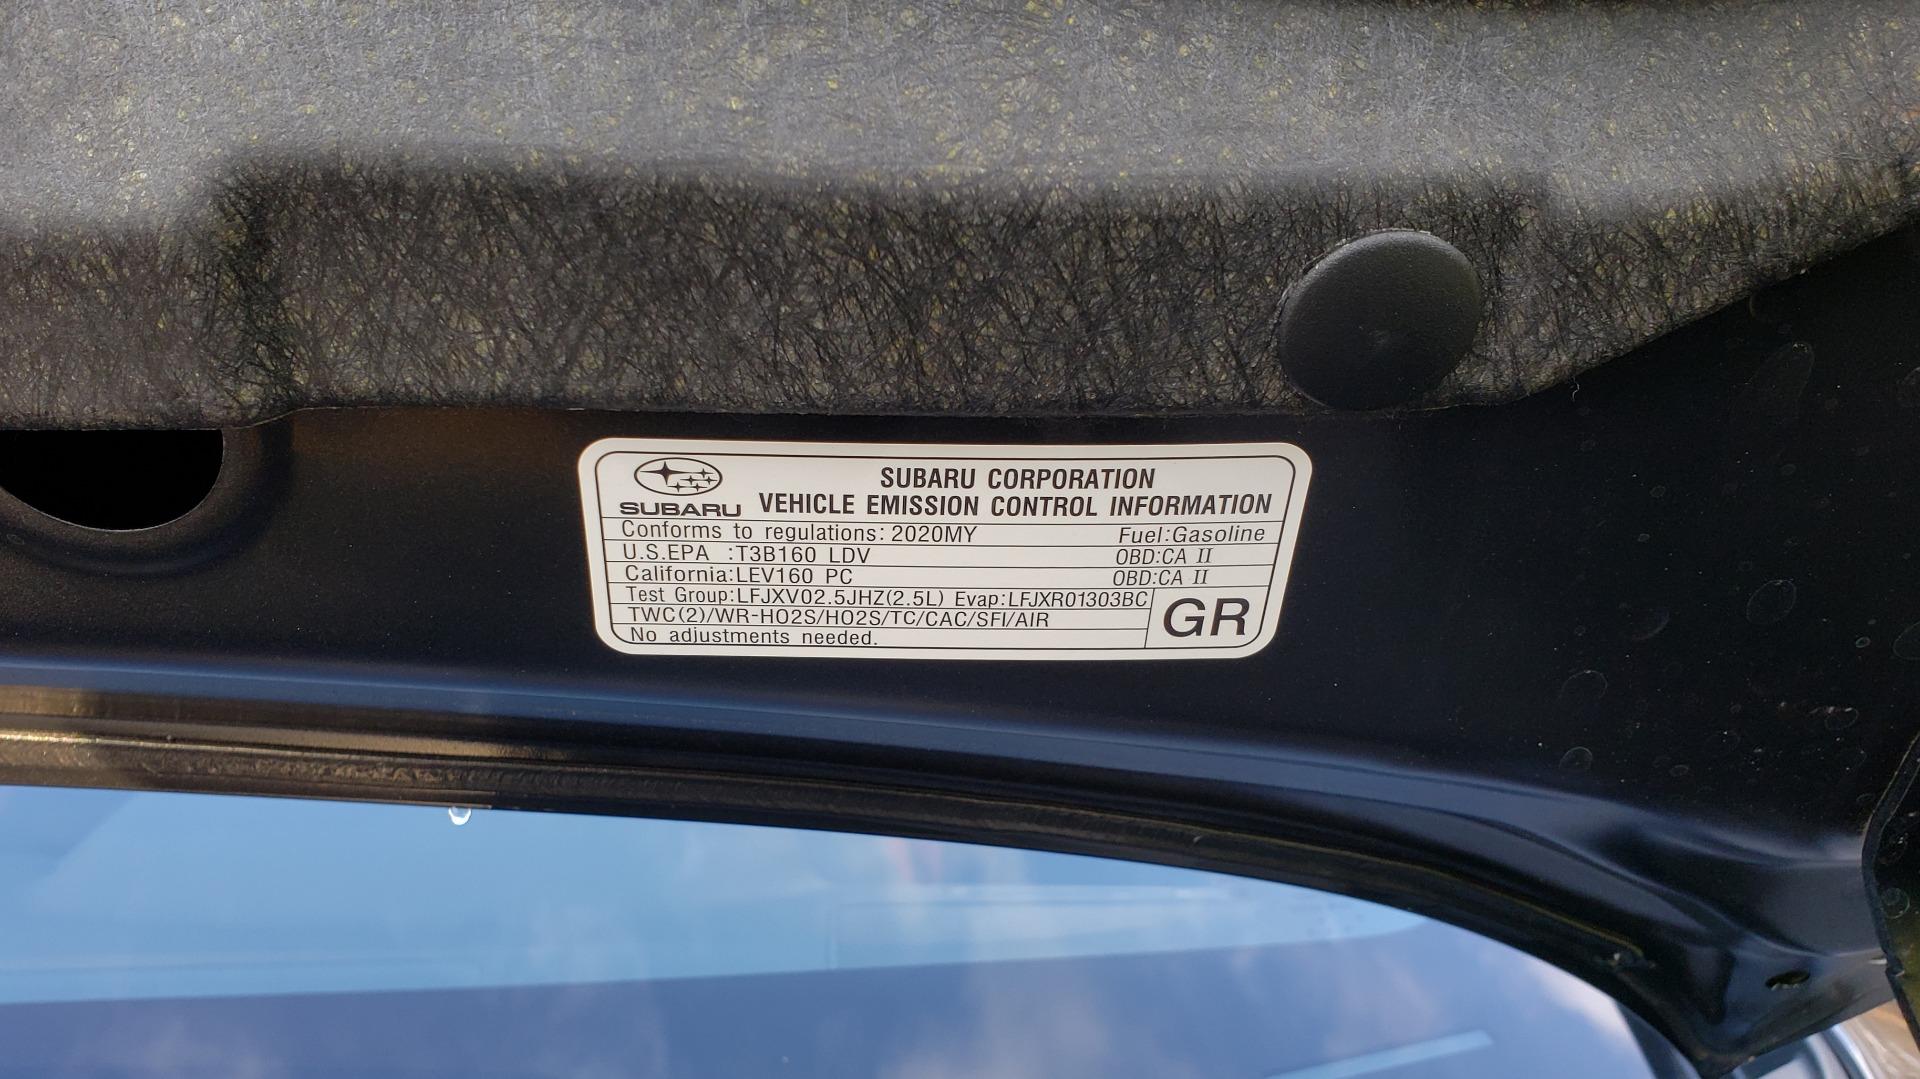 Used 2020 Subaru WRX STI 2.5L TURBO / 6-SPEED MANUAL / RECARO SEATS / REARVIEW for sale Sold at Formula Imports in Charlotte NC 28227 19